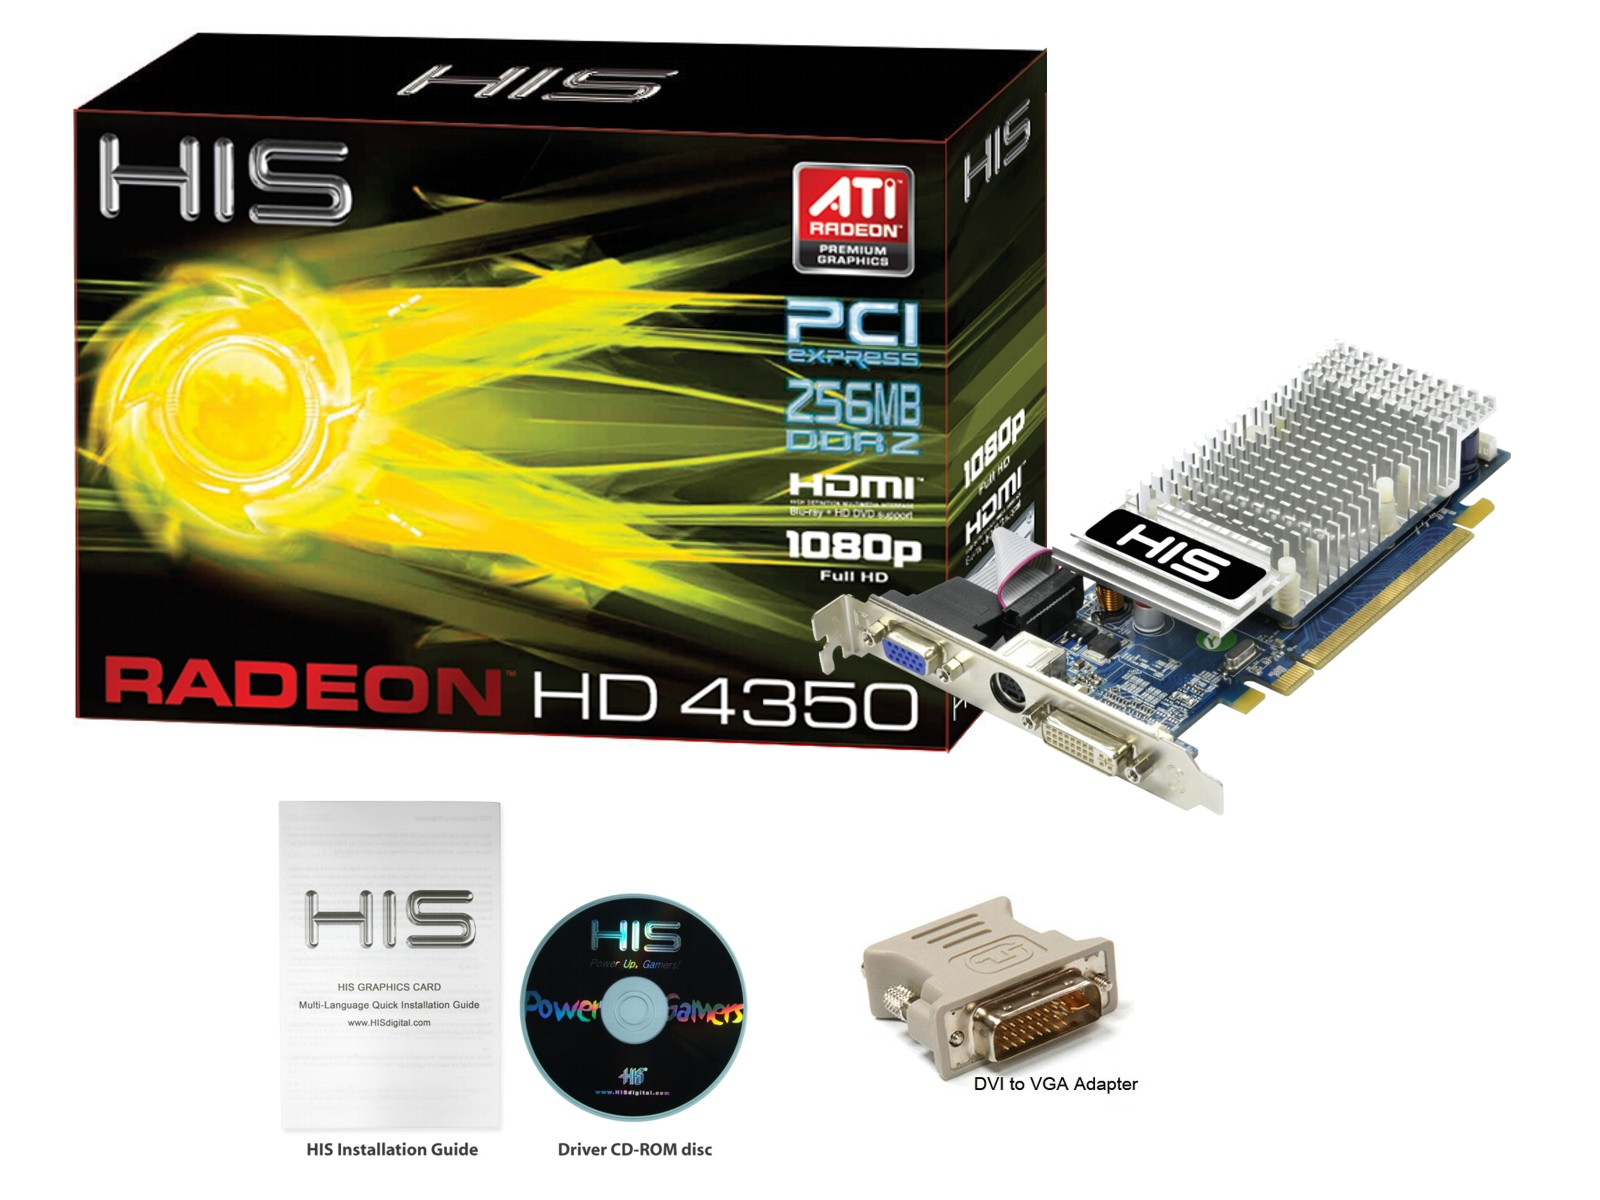 DDR3 AGP 8x Video Graphics Card 64 bit HIS Radeon HD 4350 HDMI 512MB